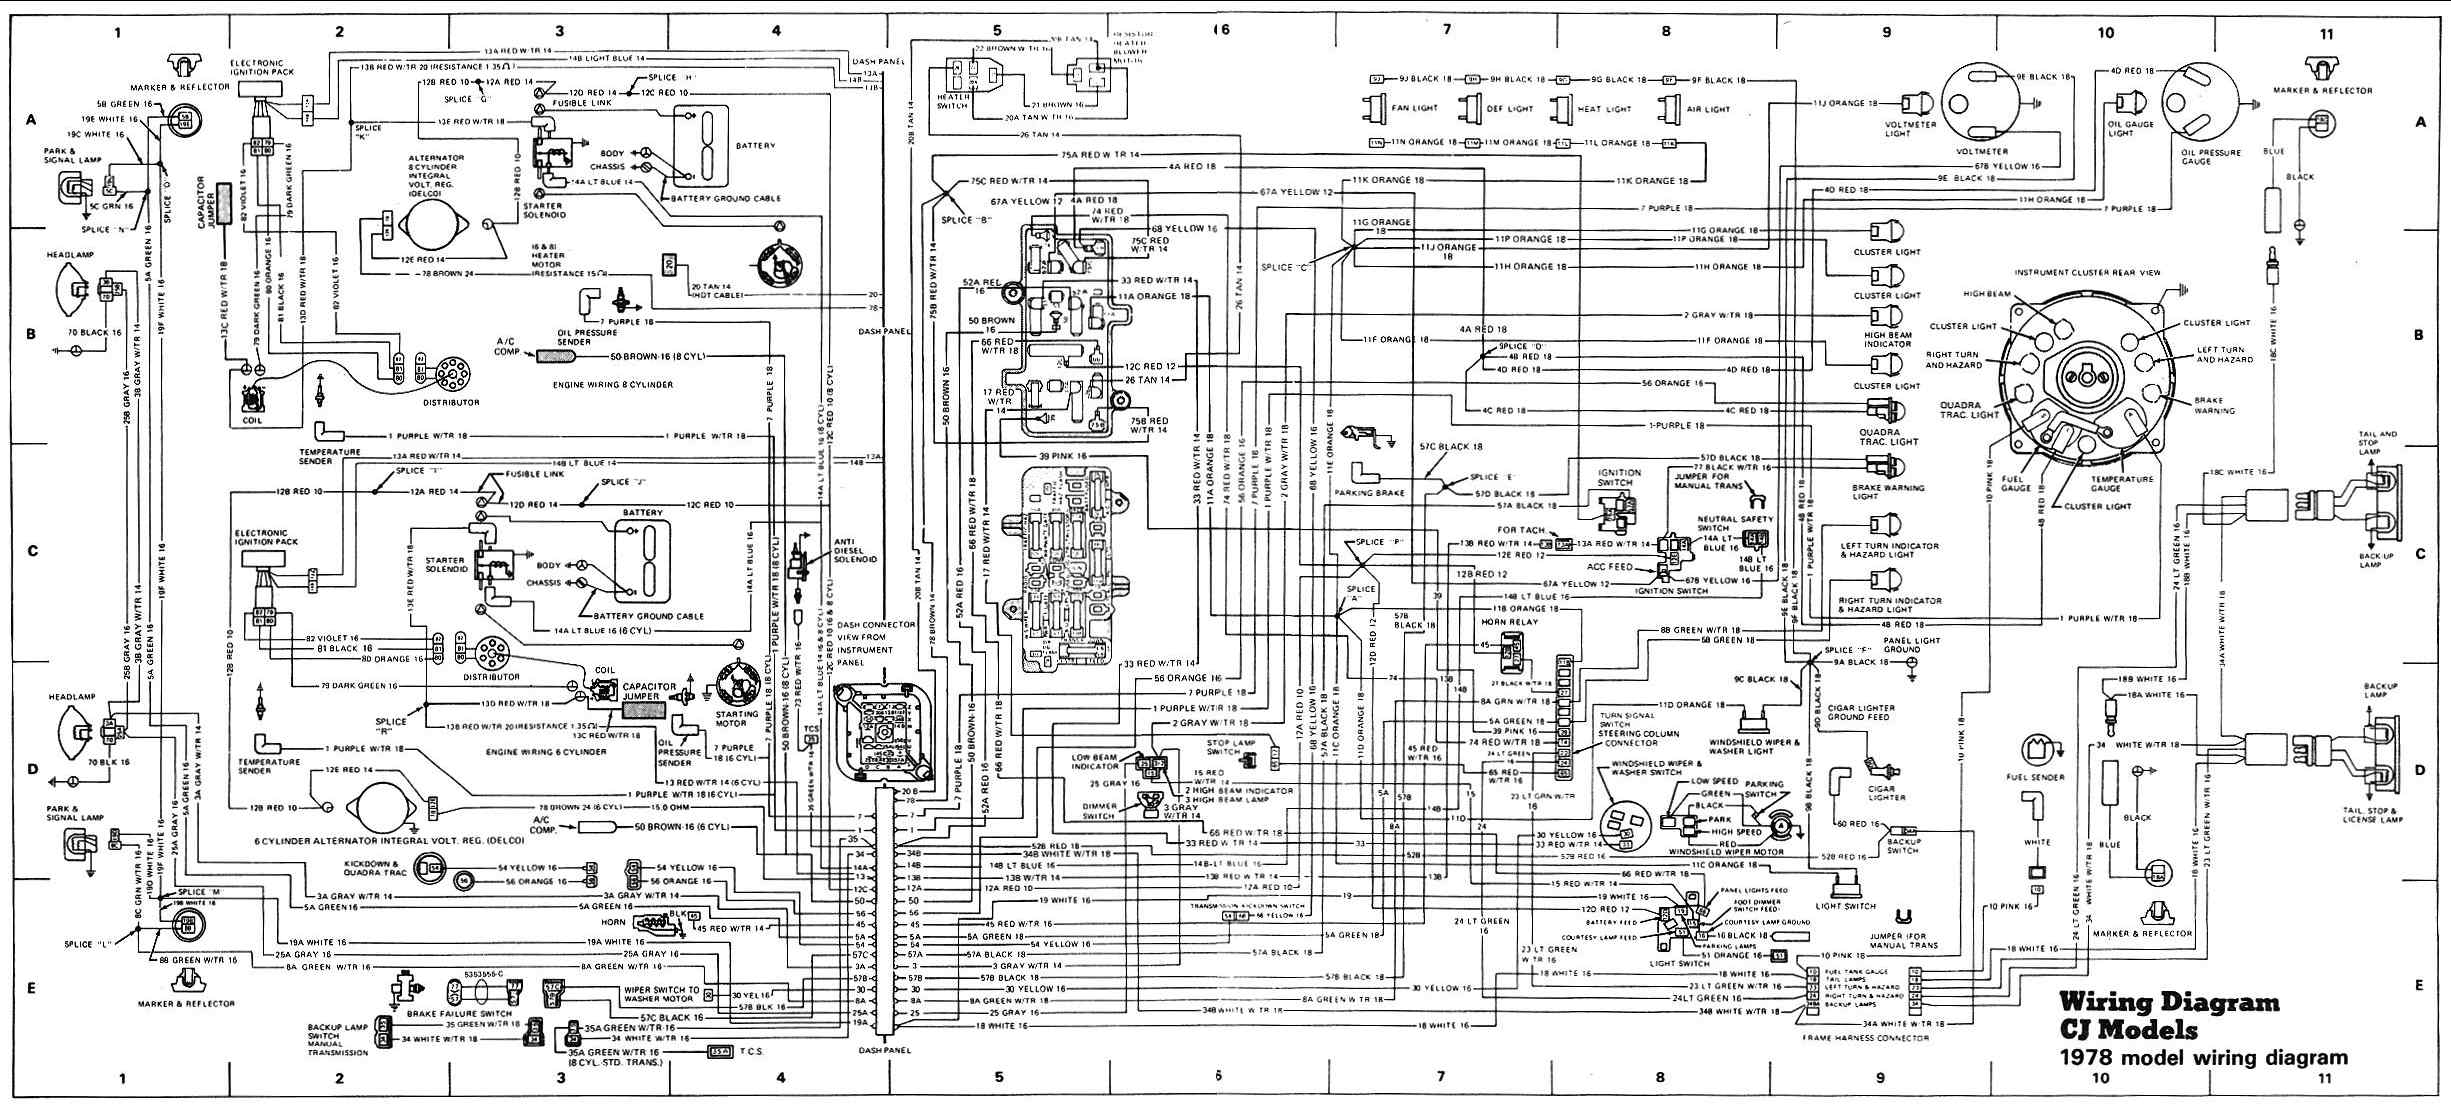 98 Grand Cherokee Pcm Wiring Diagram Trusted 2002 Jeep 1998 Electrical Work U2022 Monte Carlo